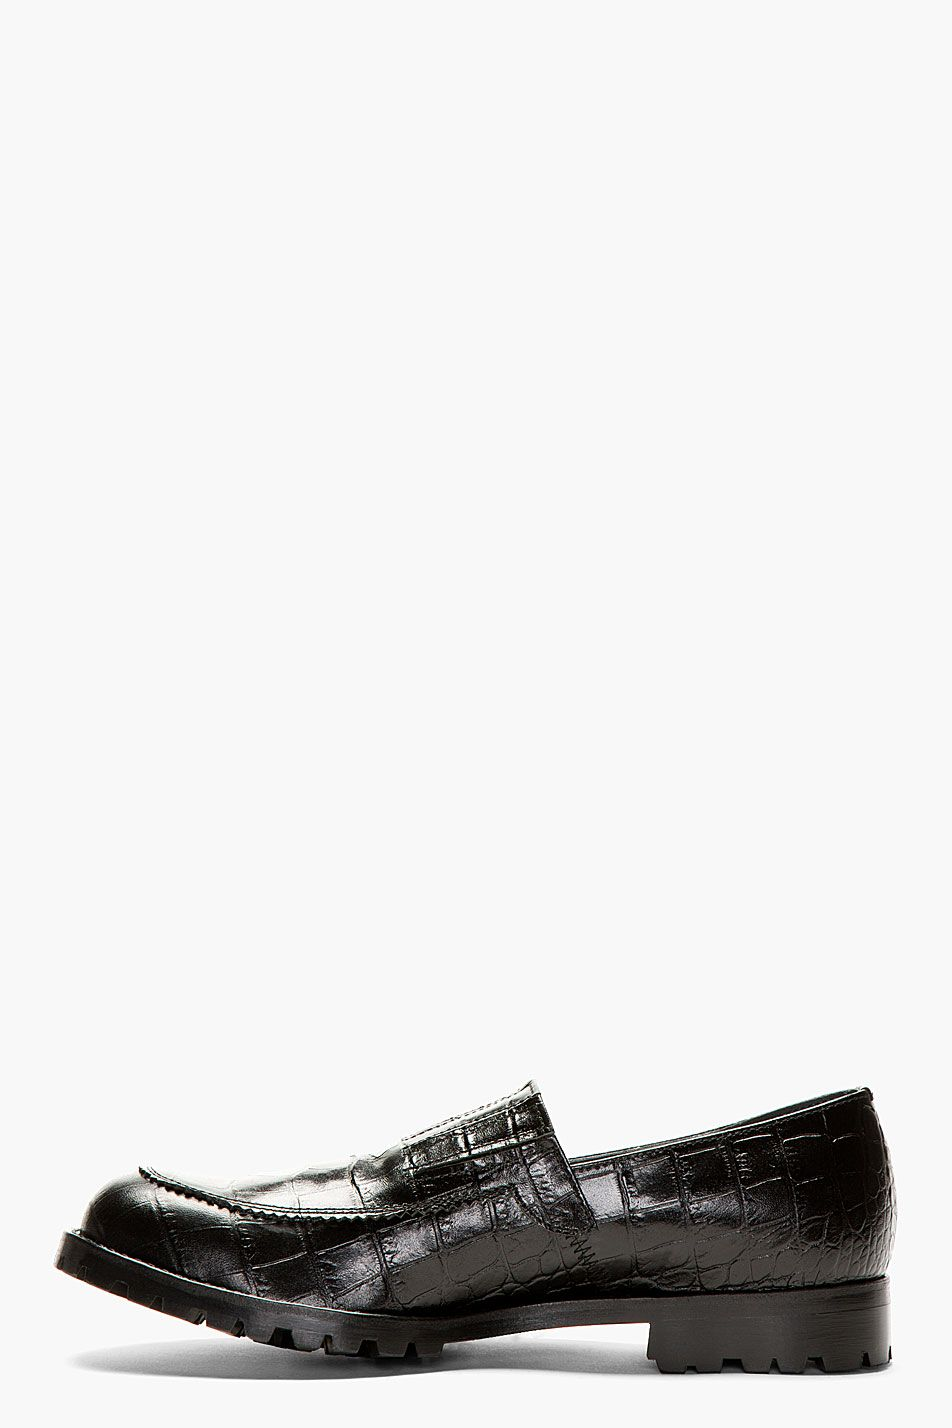 b2884d521d1bf1 COMME DES GARÇONS HOMME PLUS Black Croc-Embossed Leather Loafers ...